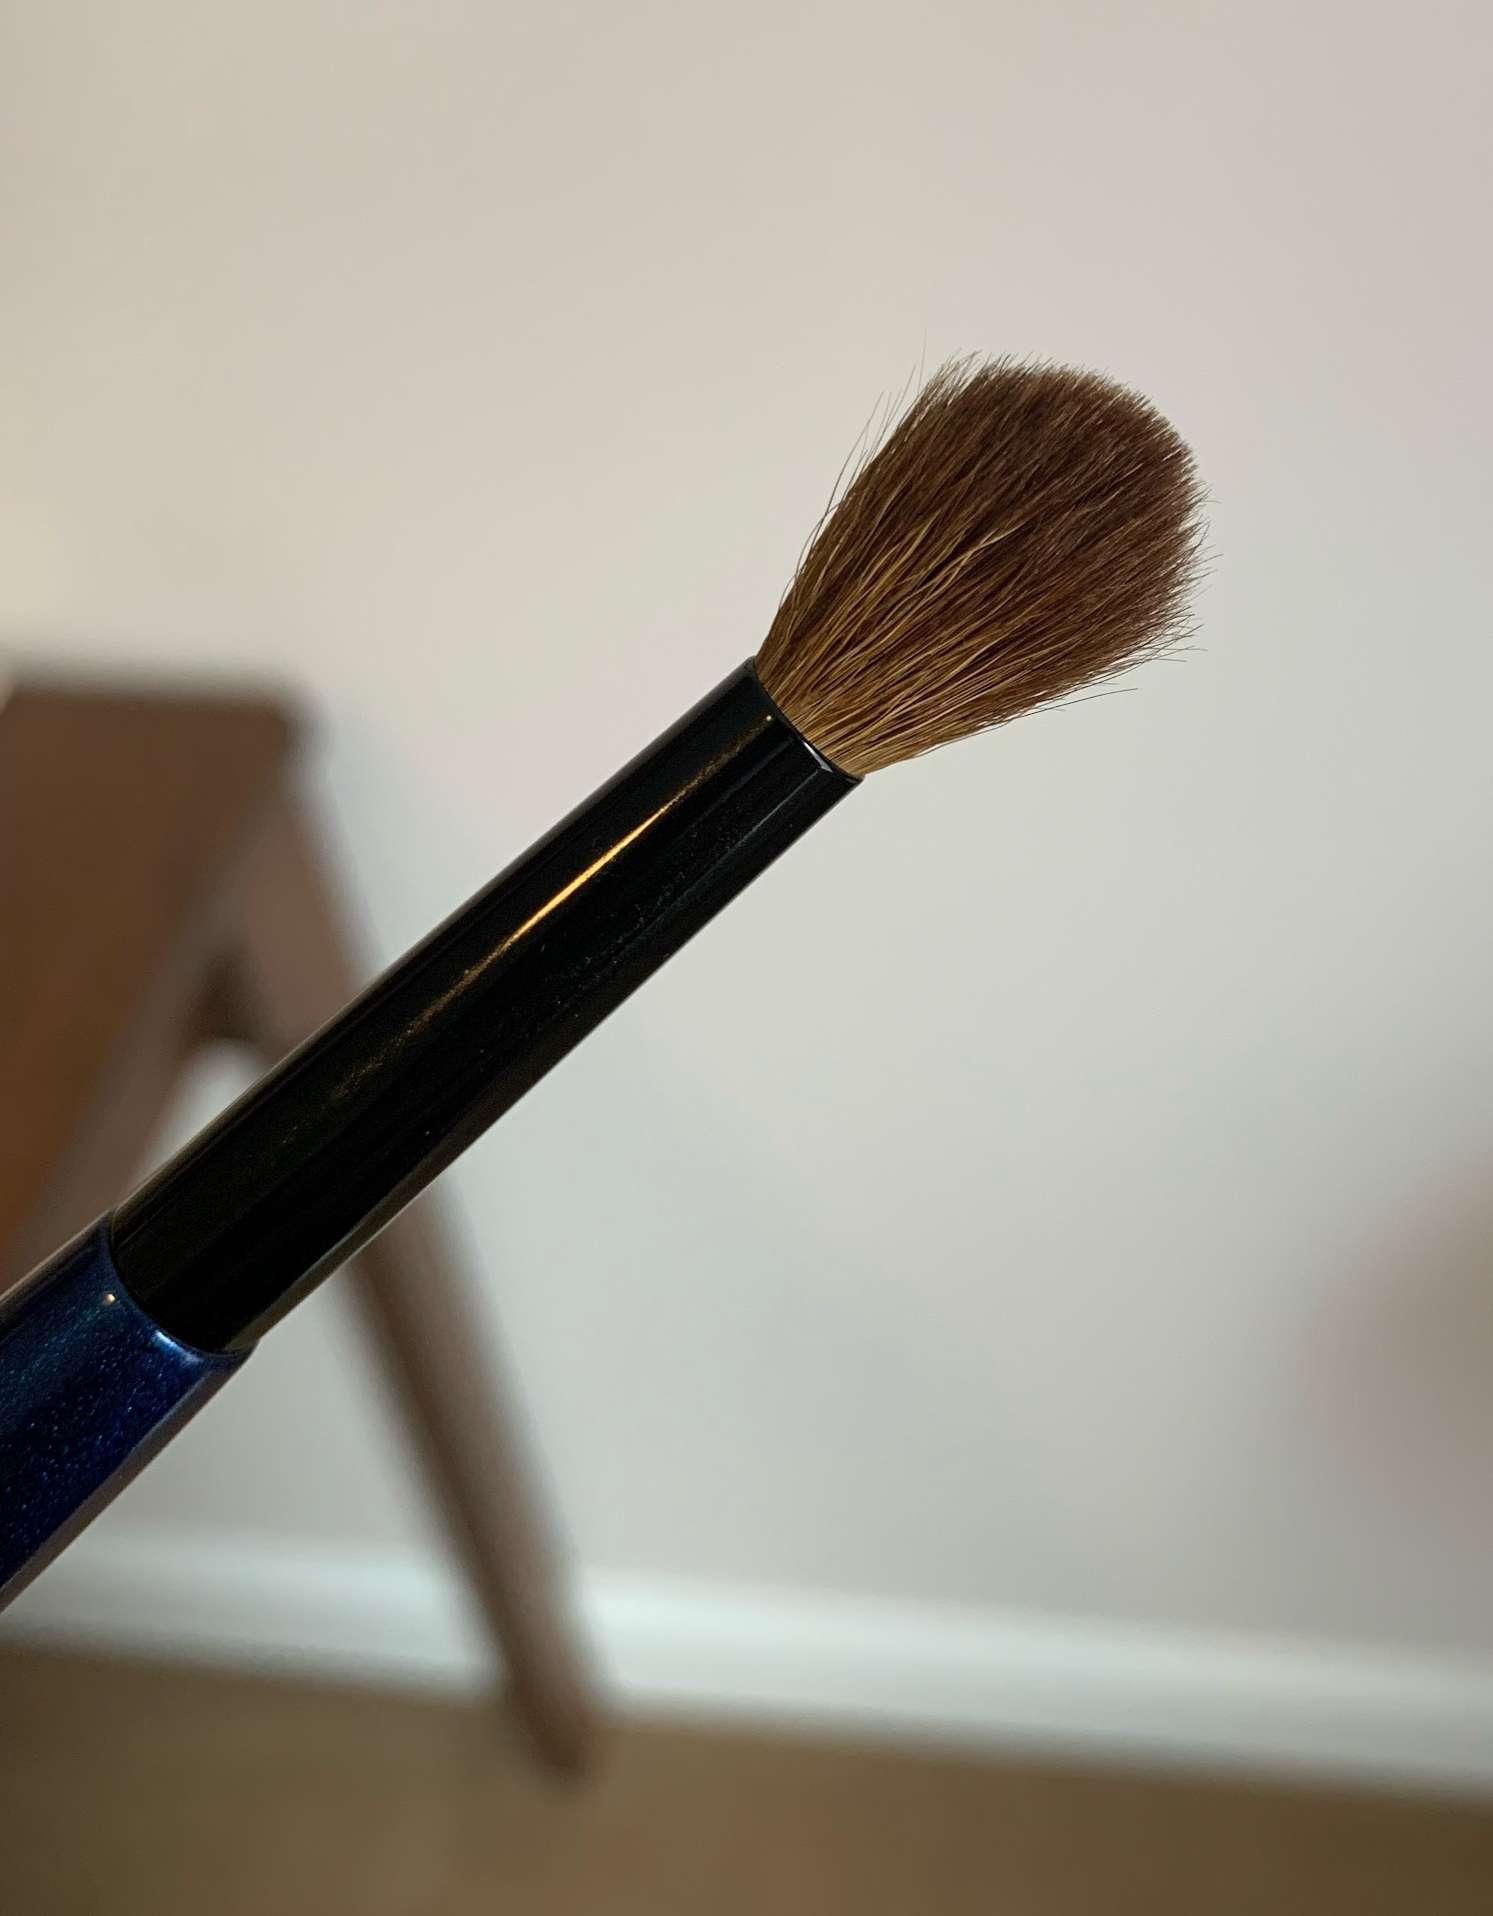 Sonia G Classic Crease Brush Review